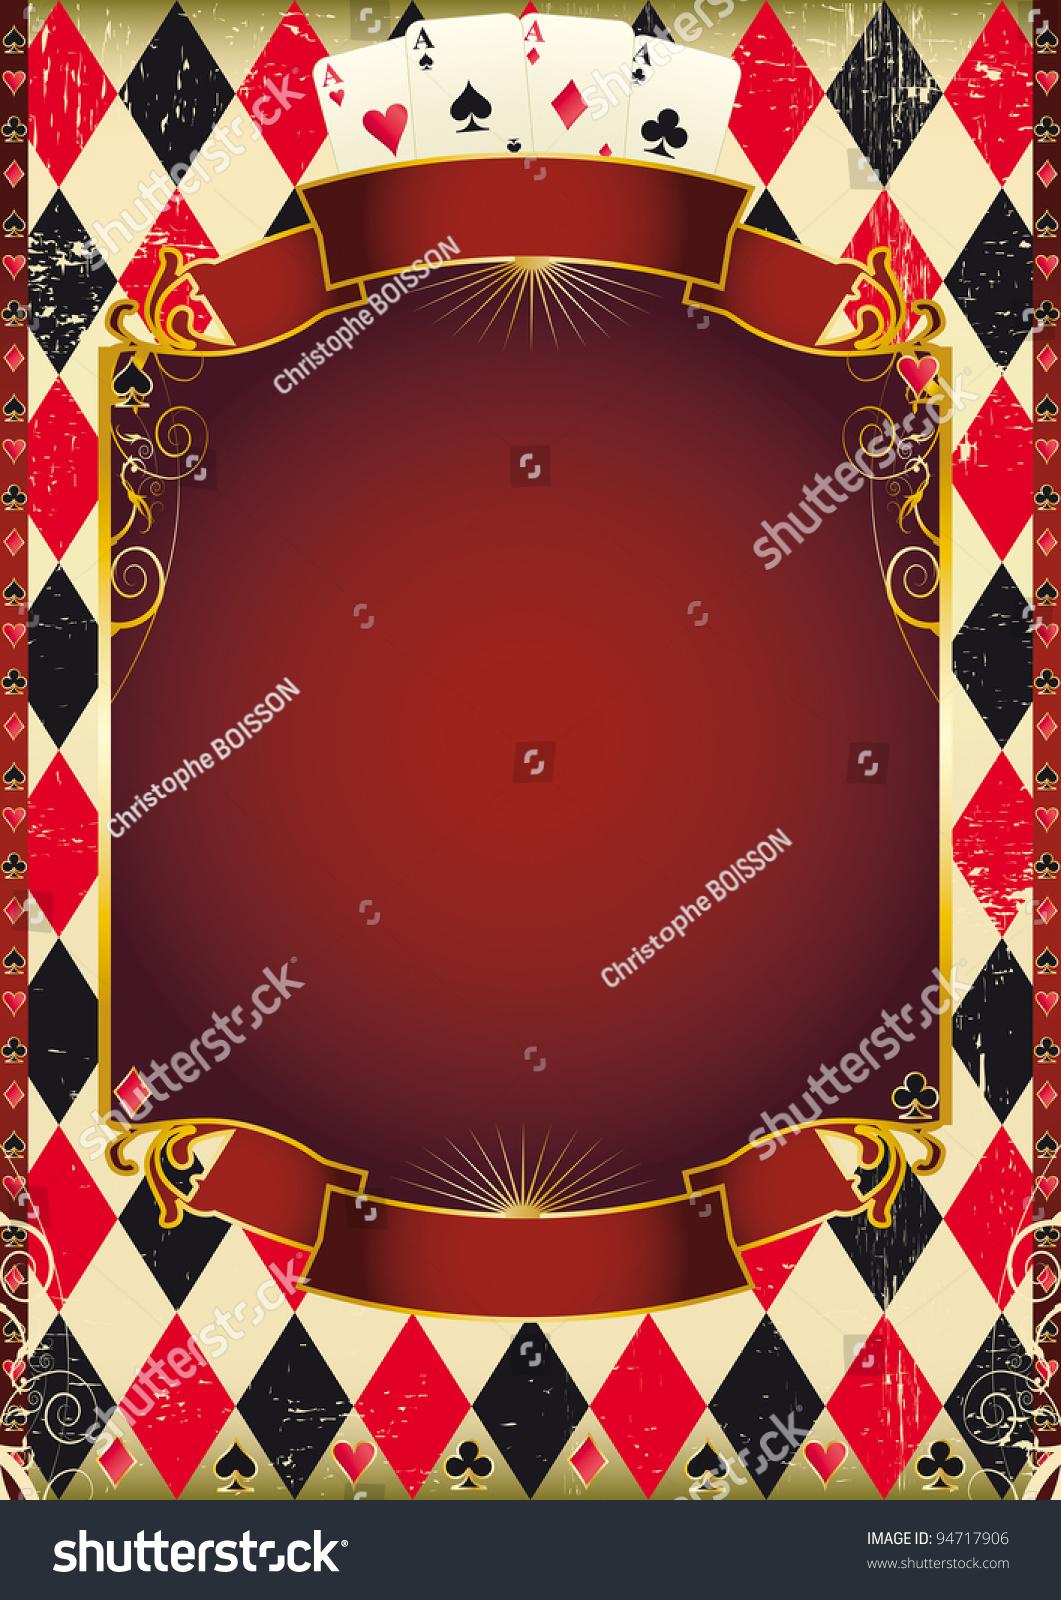 World poker tour wallpaper   Buffalo spirit slot machine big win 1061x1600